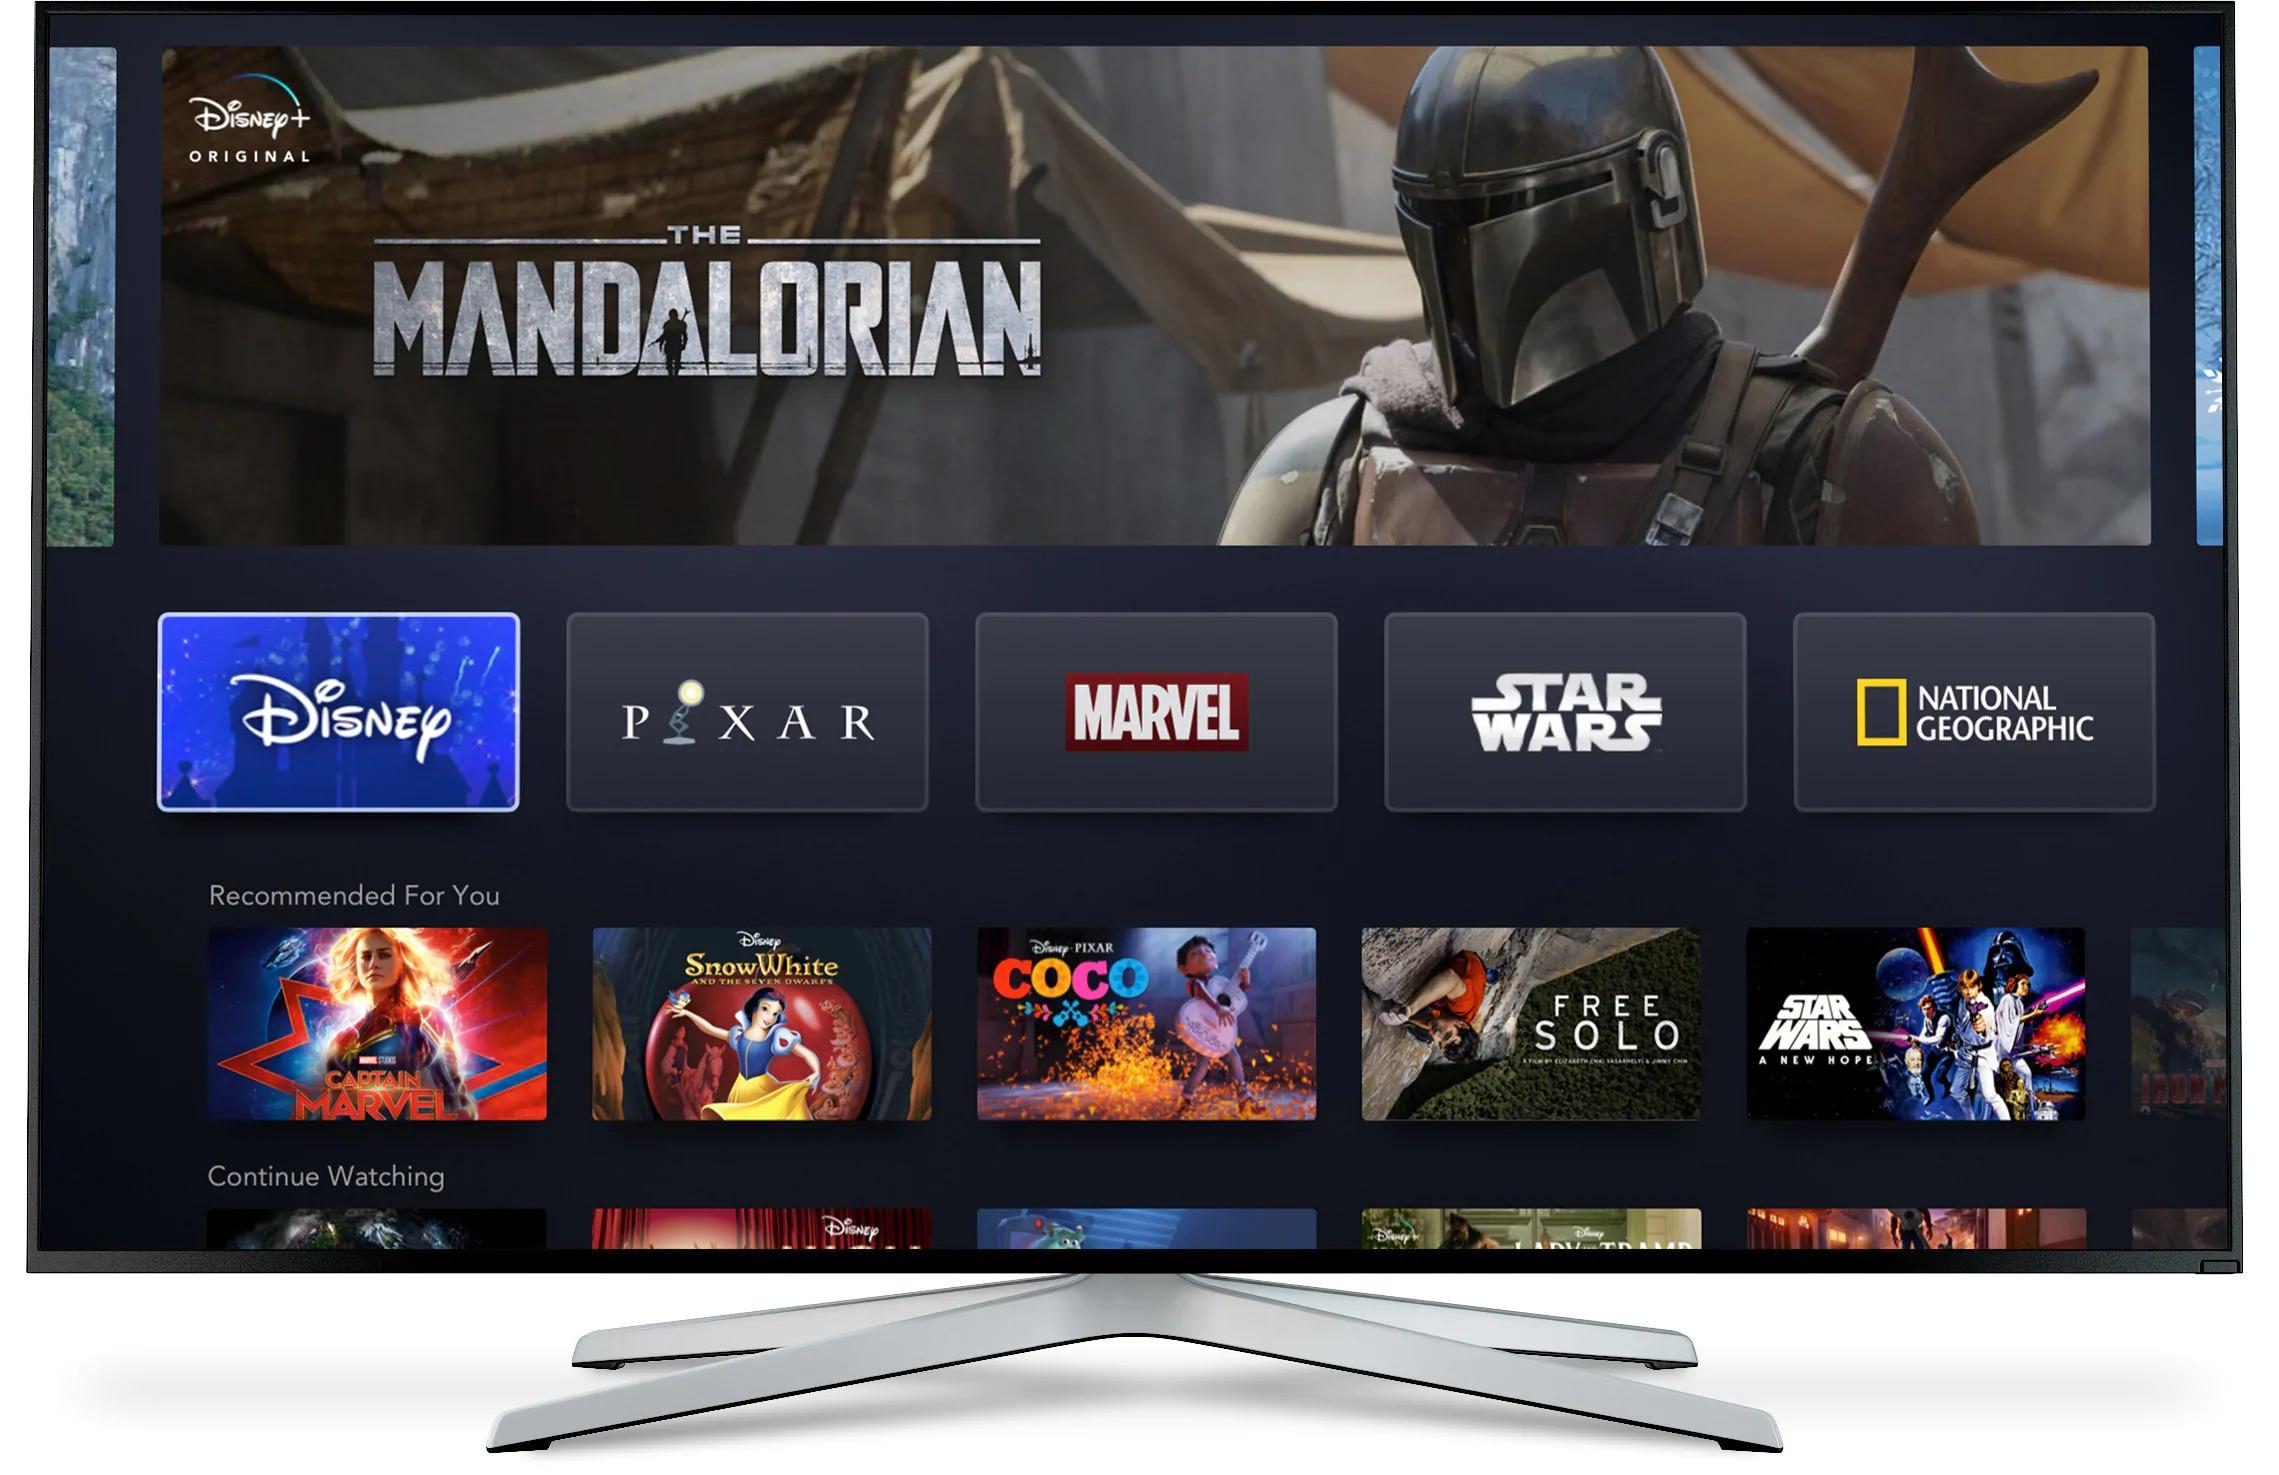 Disney+ on a smart TV